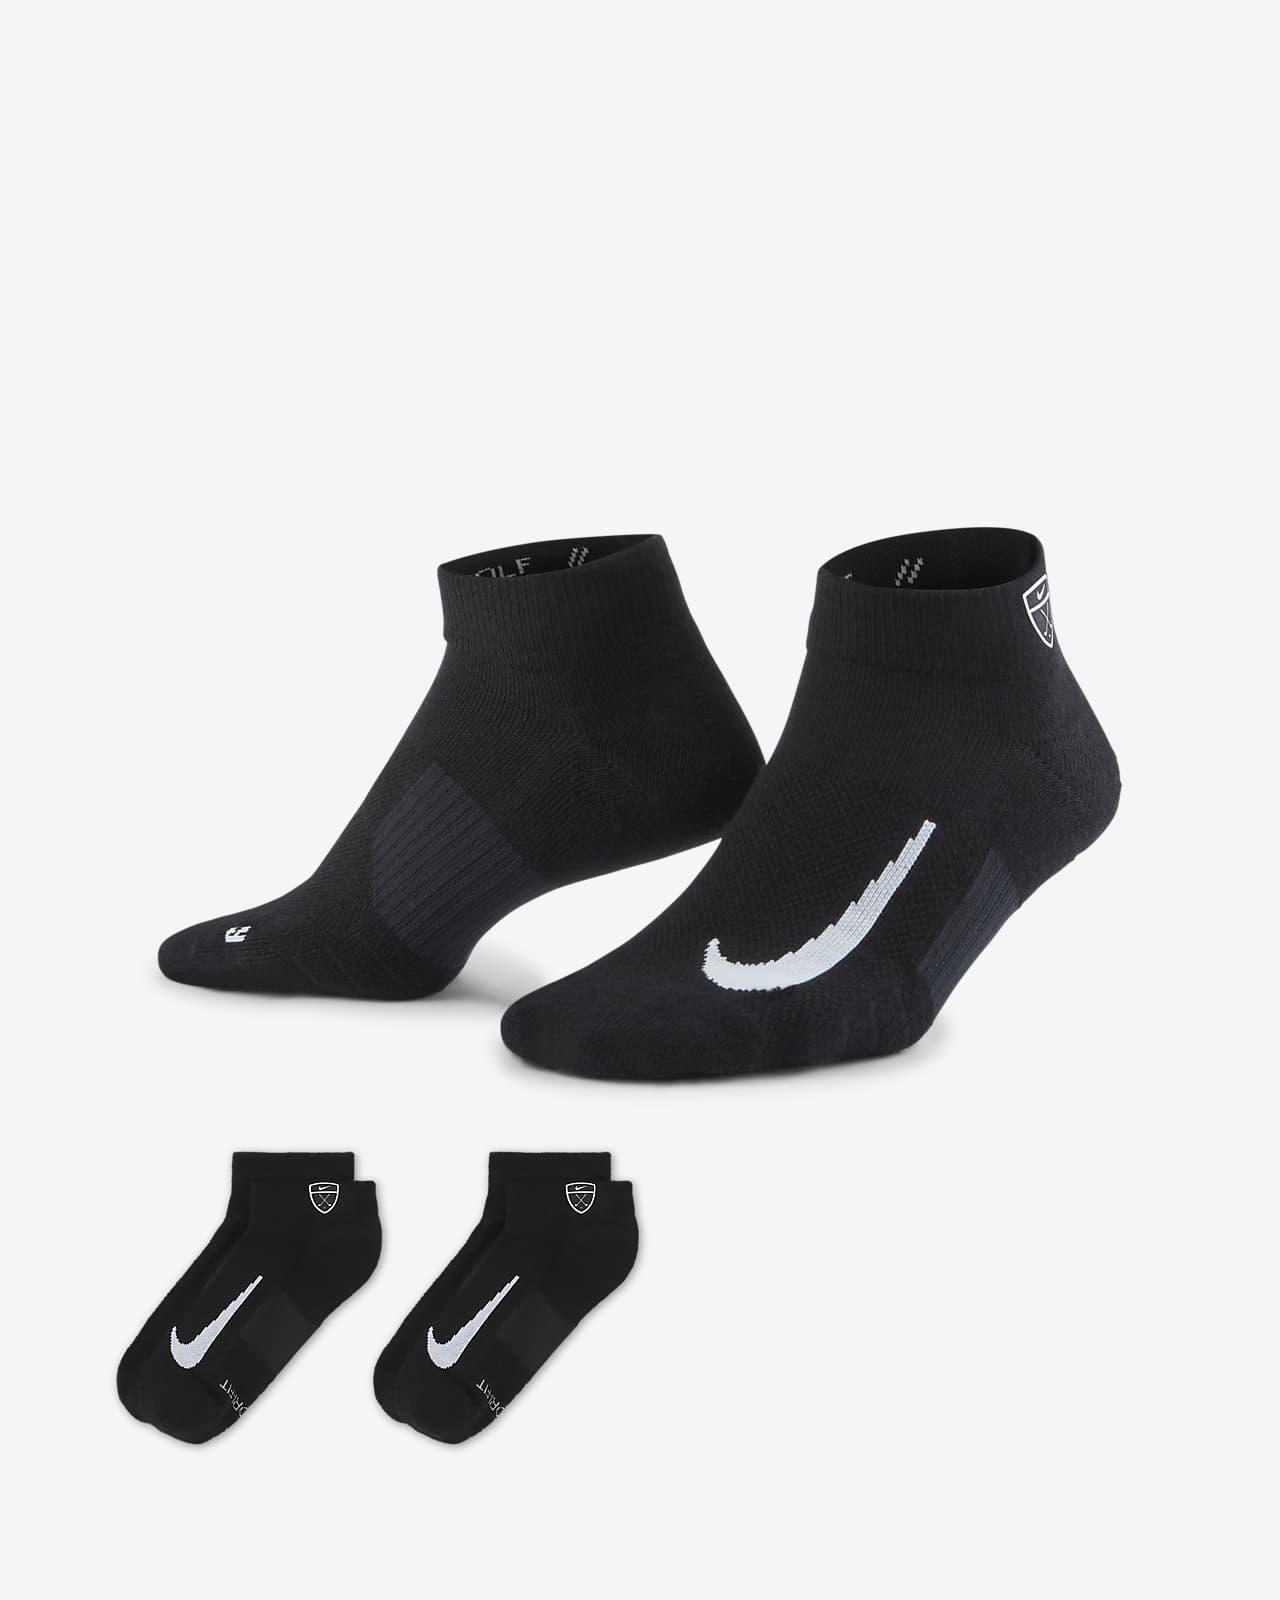 Calcetines cortos de golf Nike Multiplier Low (2 pares)